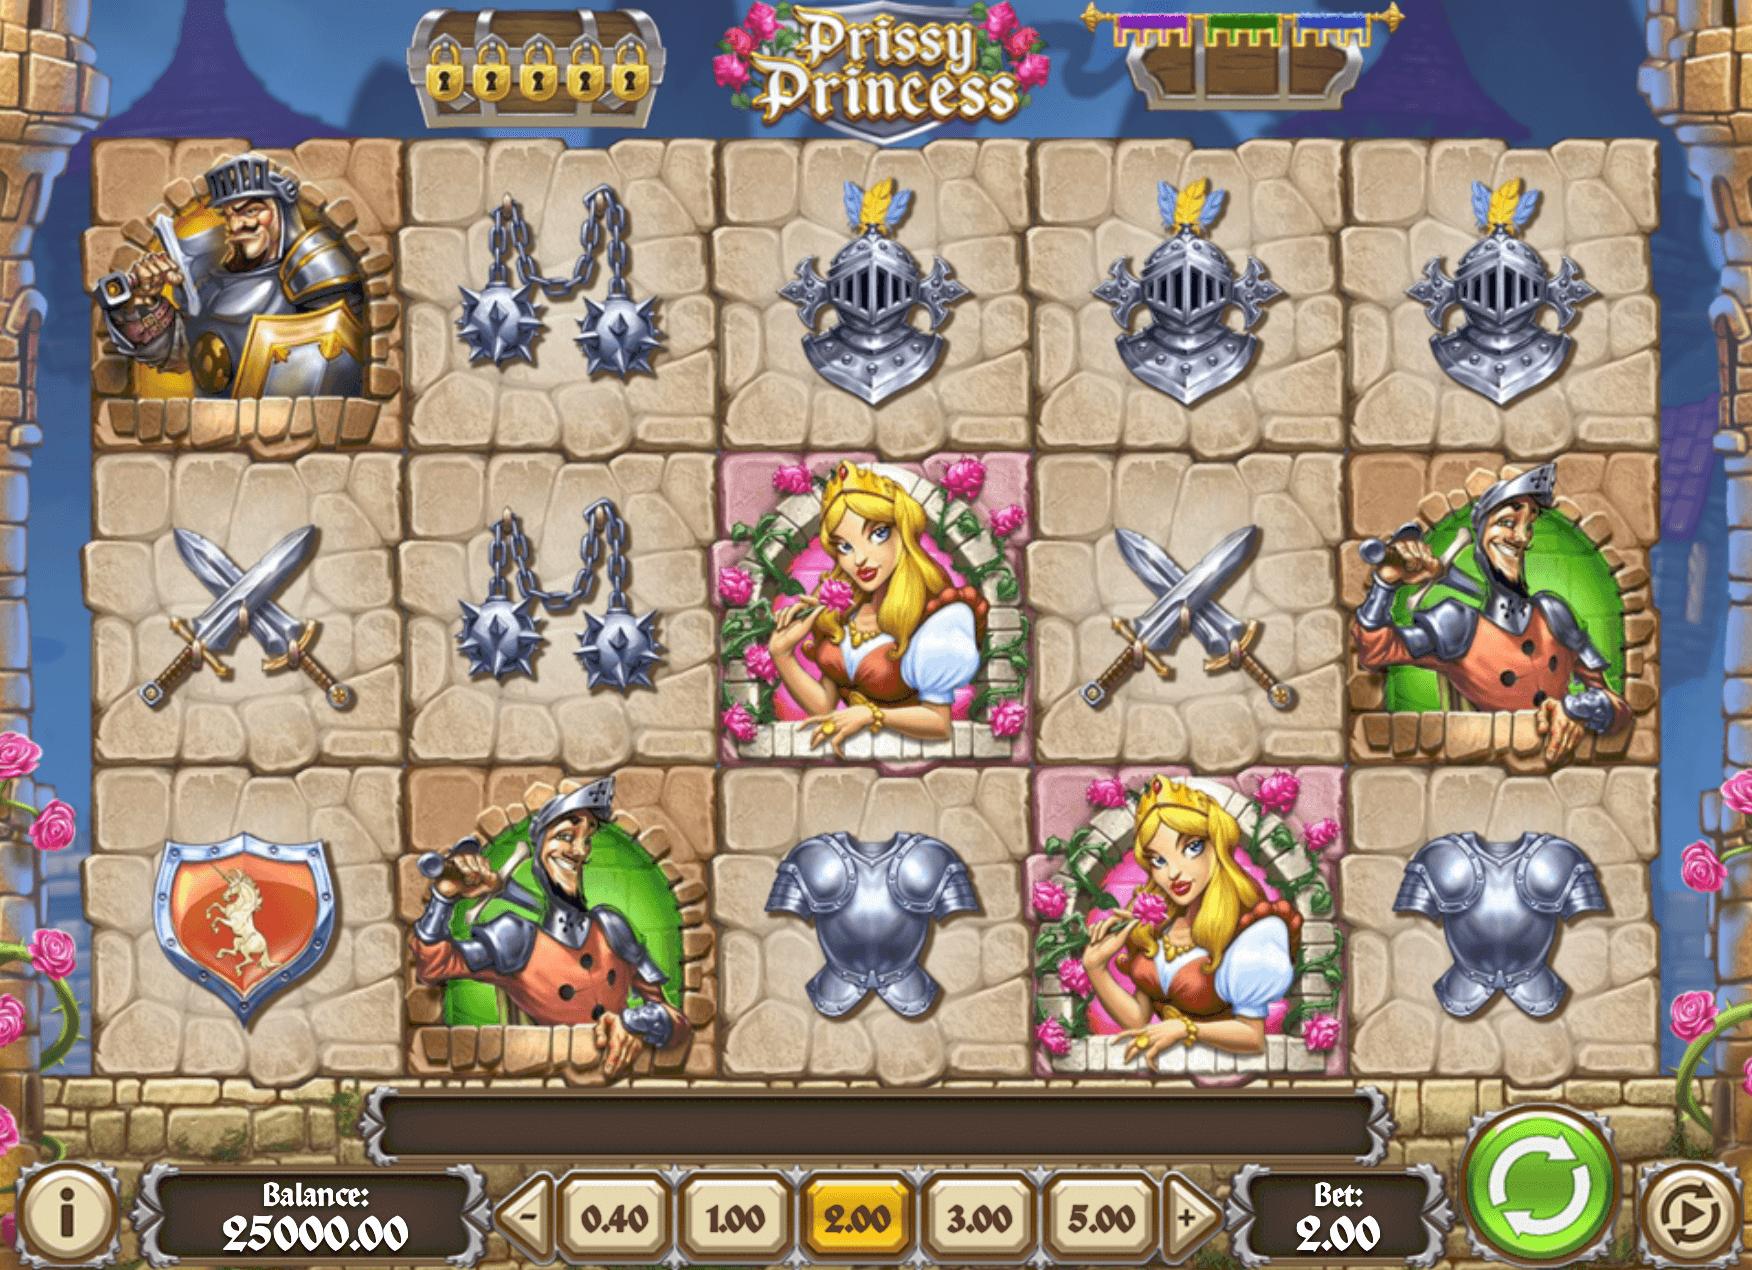 Prissy Princess Online Slot